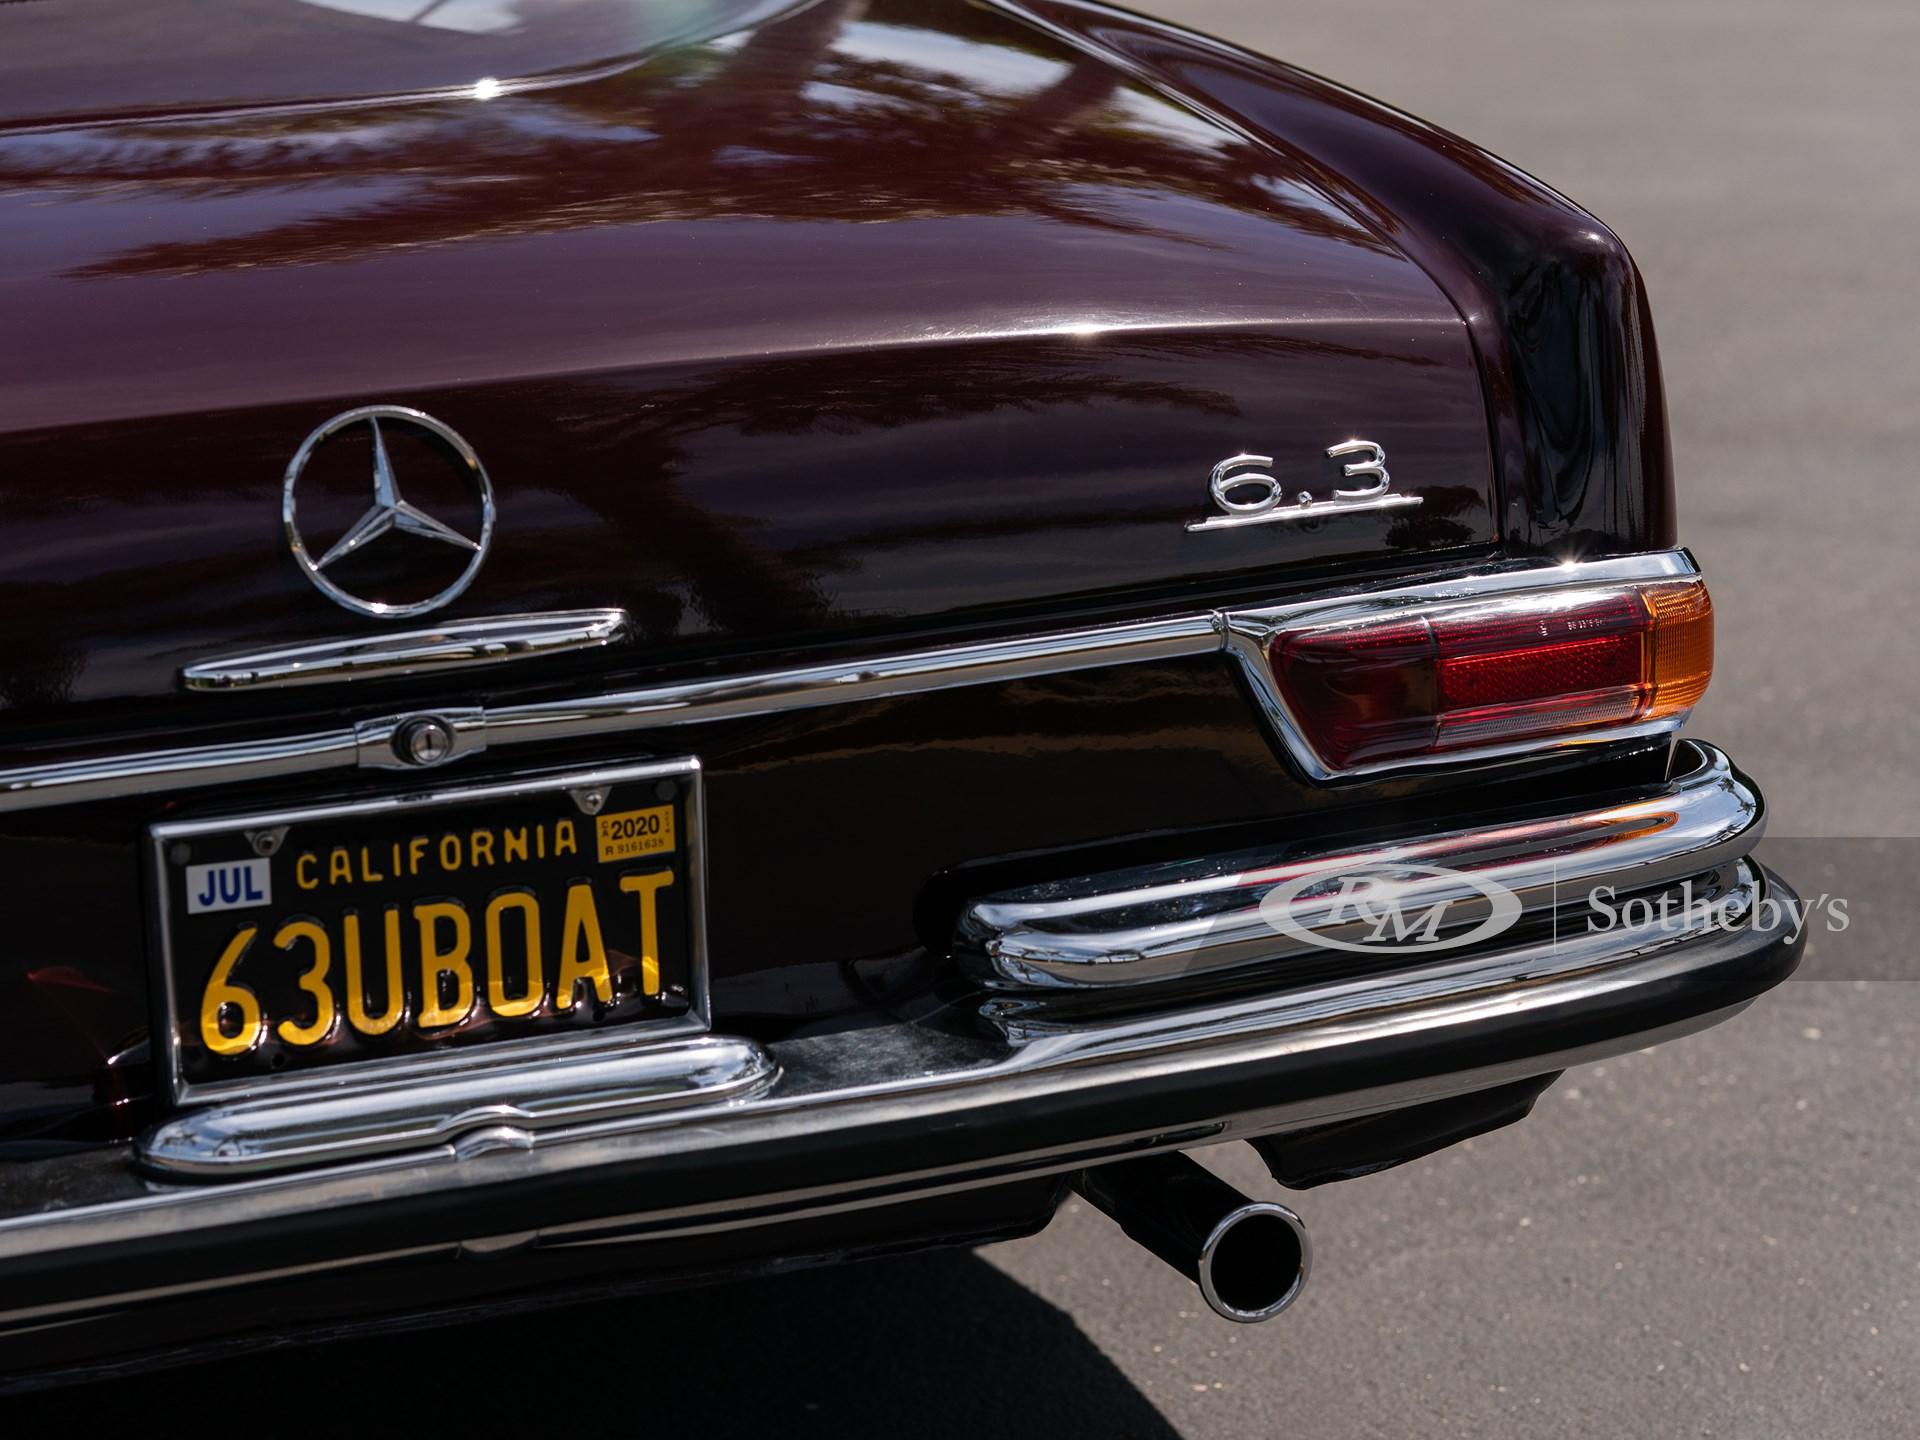 1964 Mercedes-Benz 220 SEb 6.3 Conversion  -